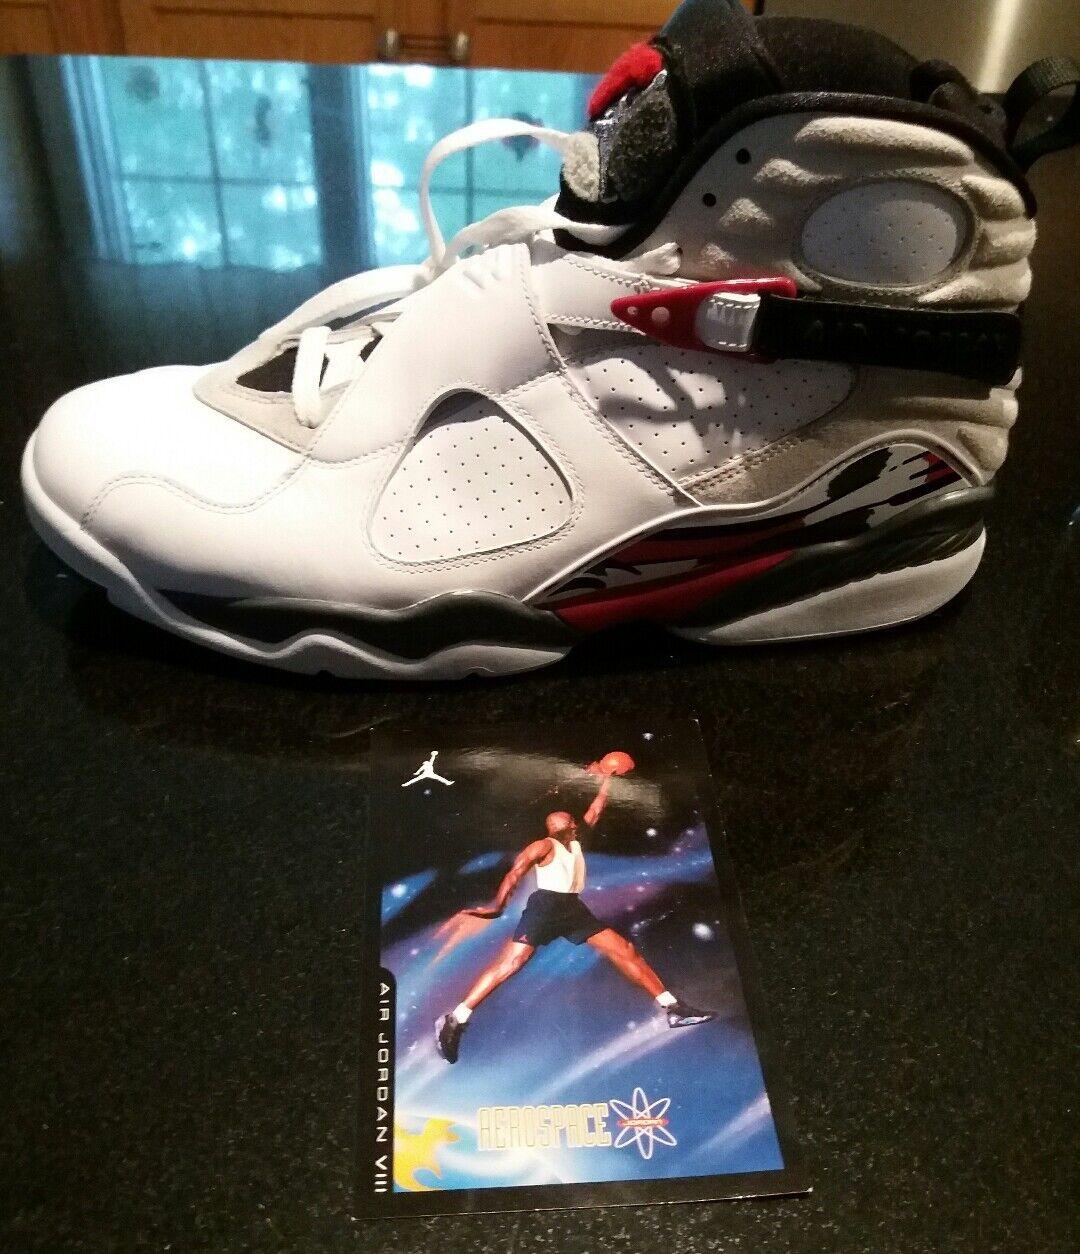 Nike Air Jordan Retro 8 space jam size 13 shoes white brand new